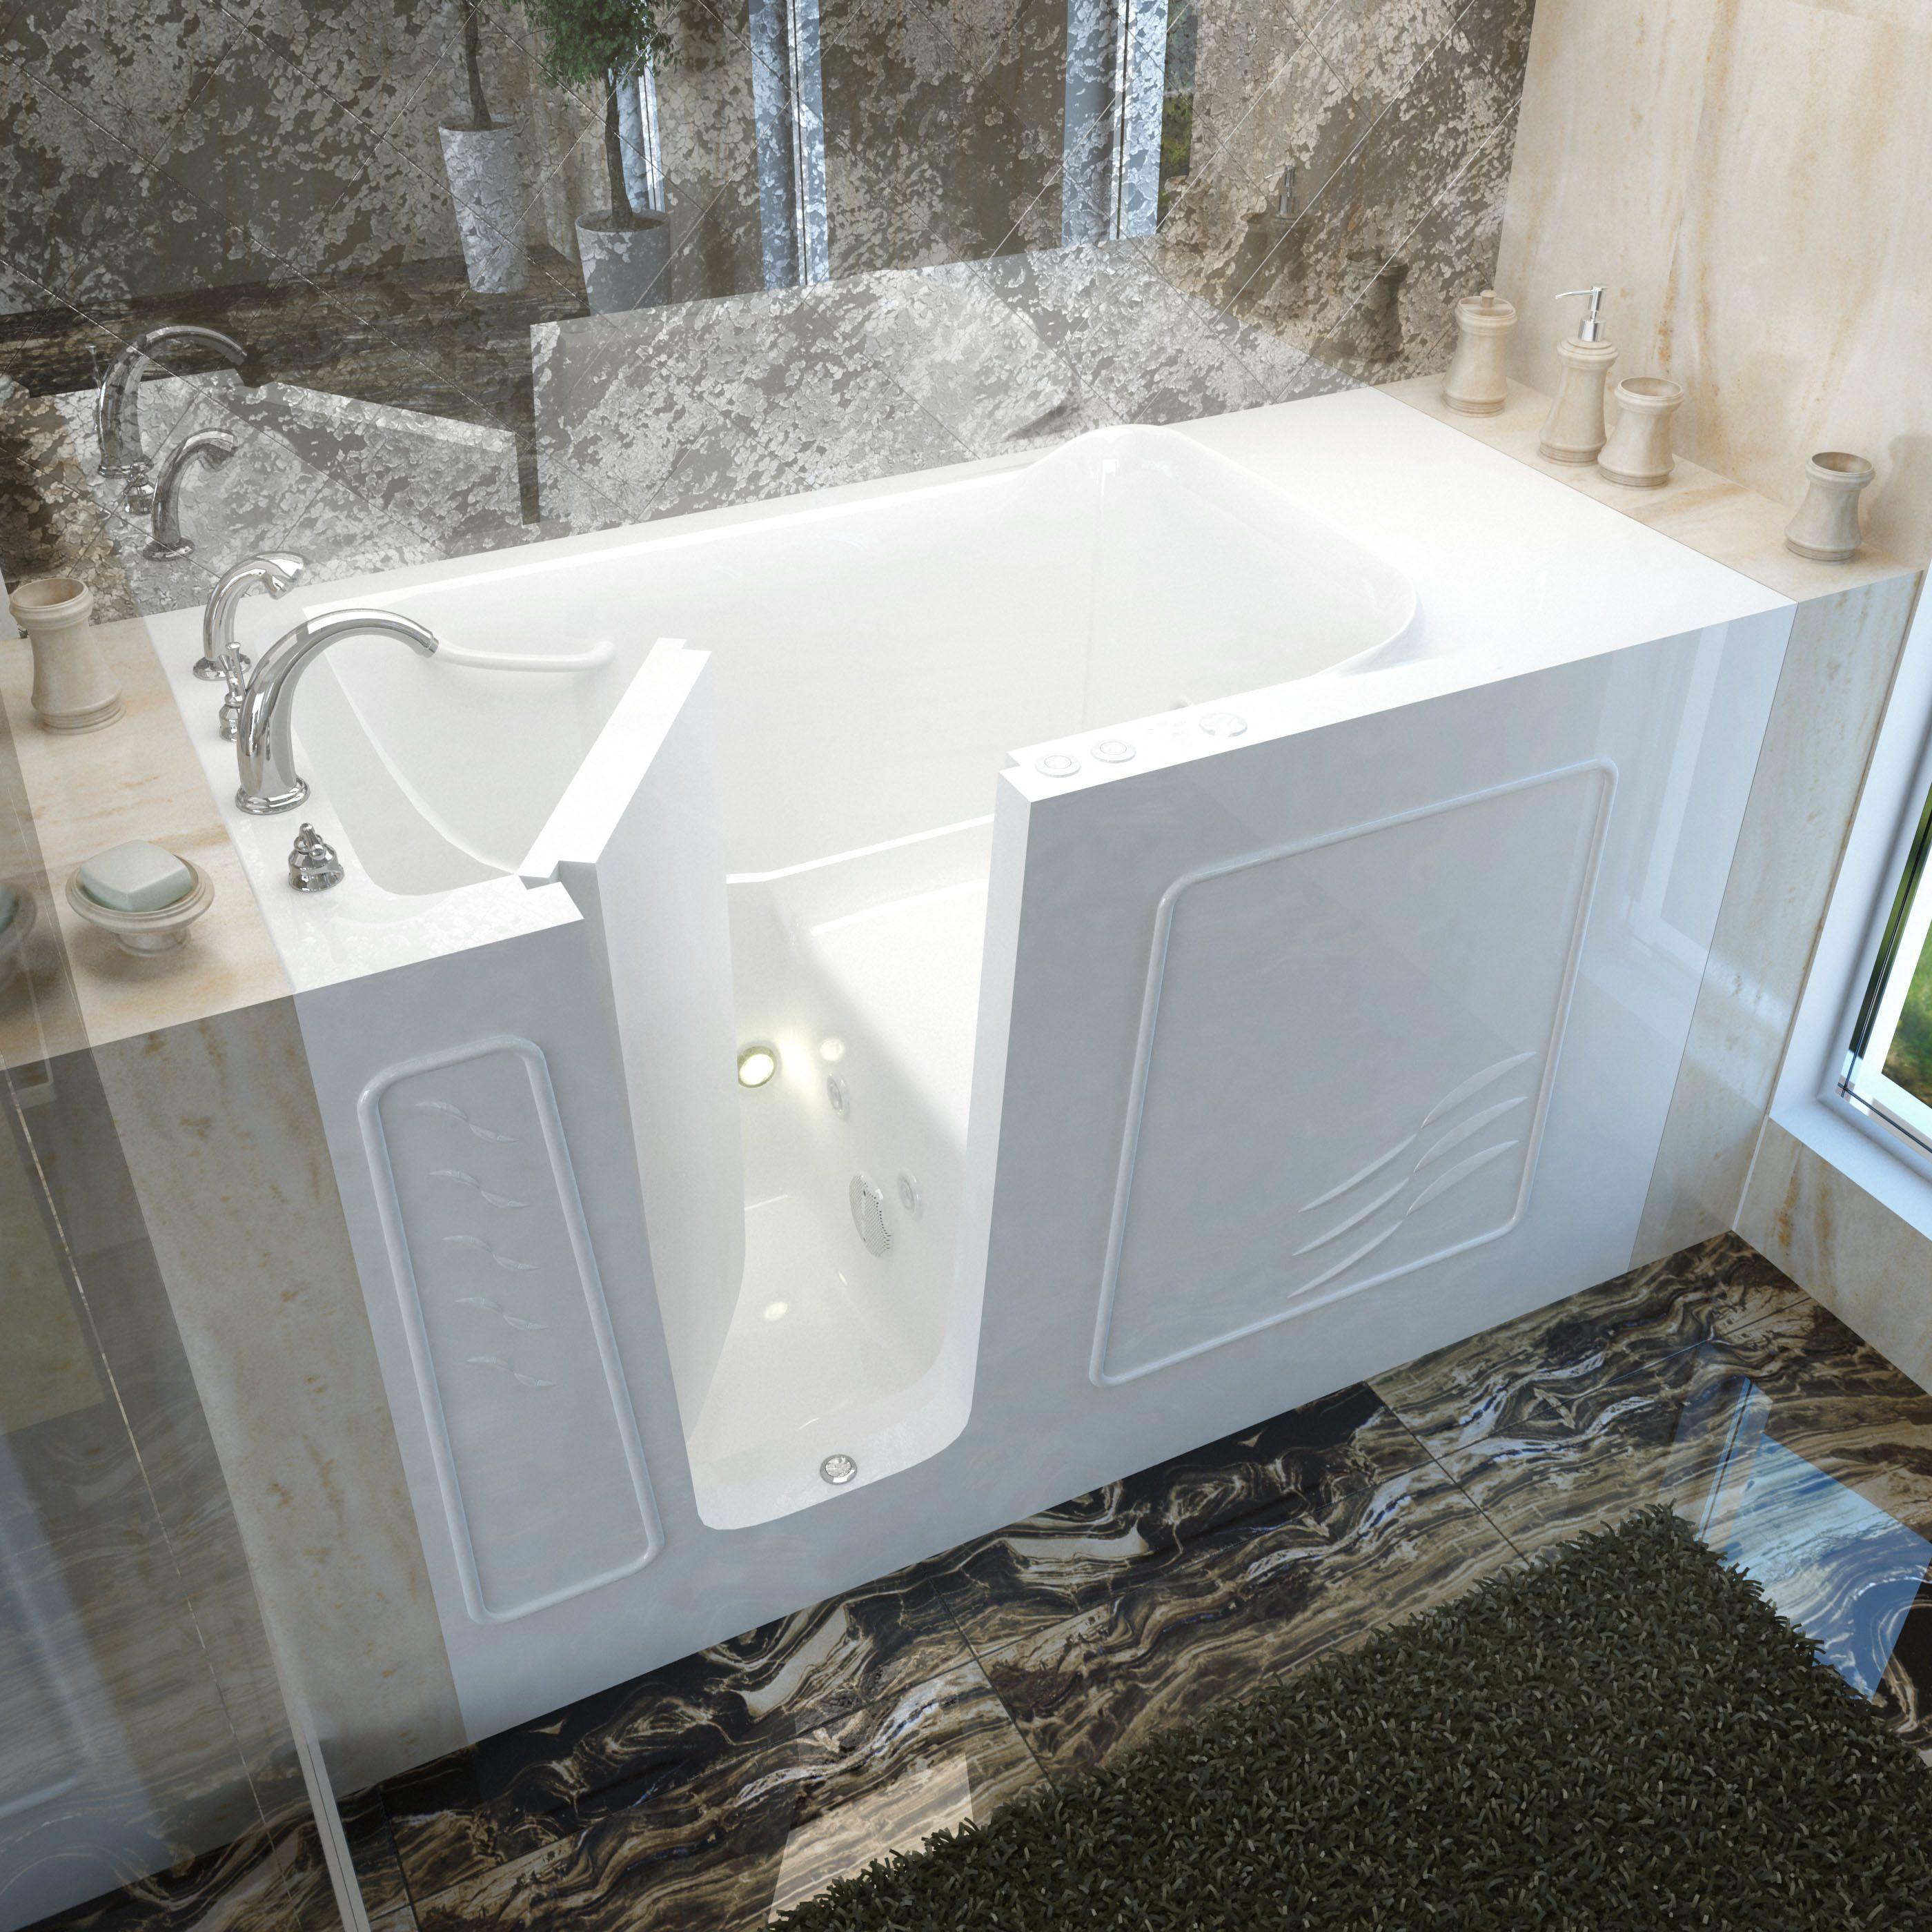 MediTub 30x60-inch Left Drain White Whirlpool Jetted Walk-In Bathtub ...